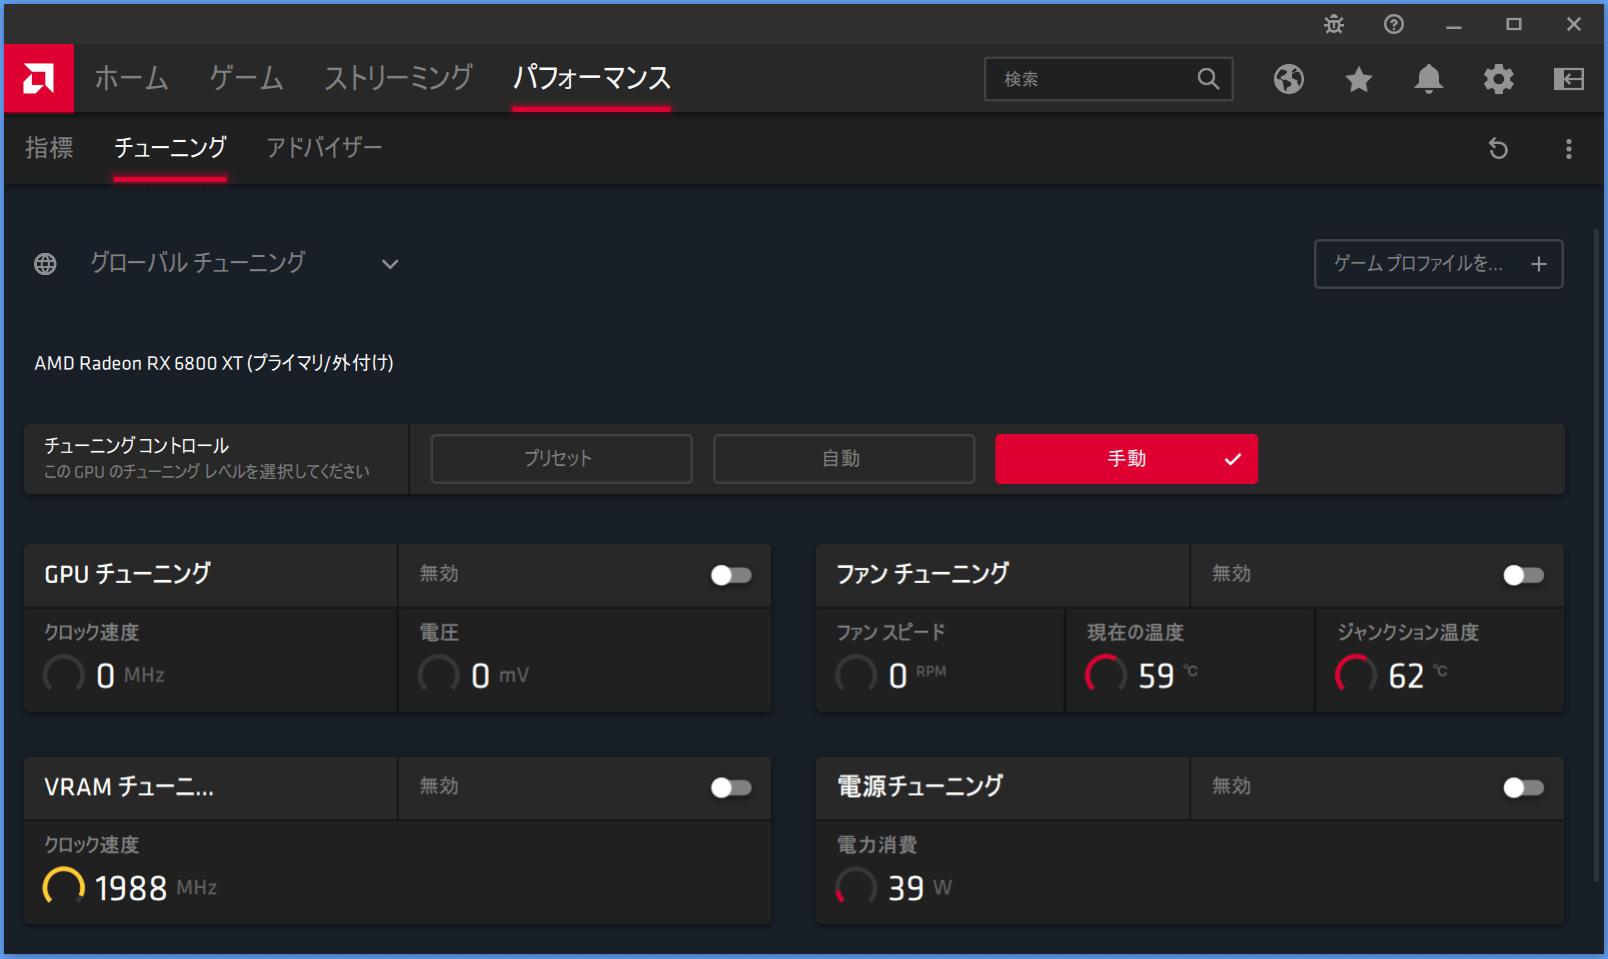 Radeon RX 6800 XT_Radeon-Setting_3